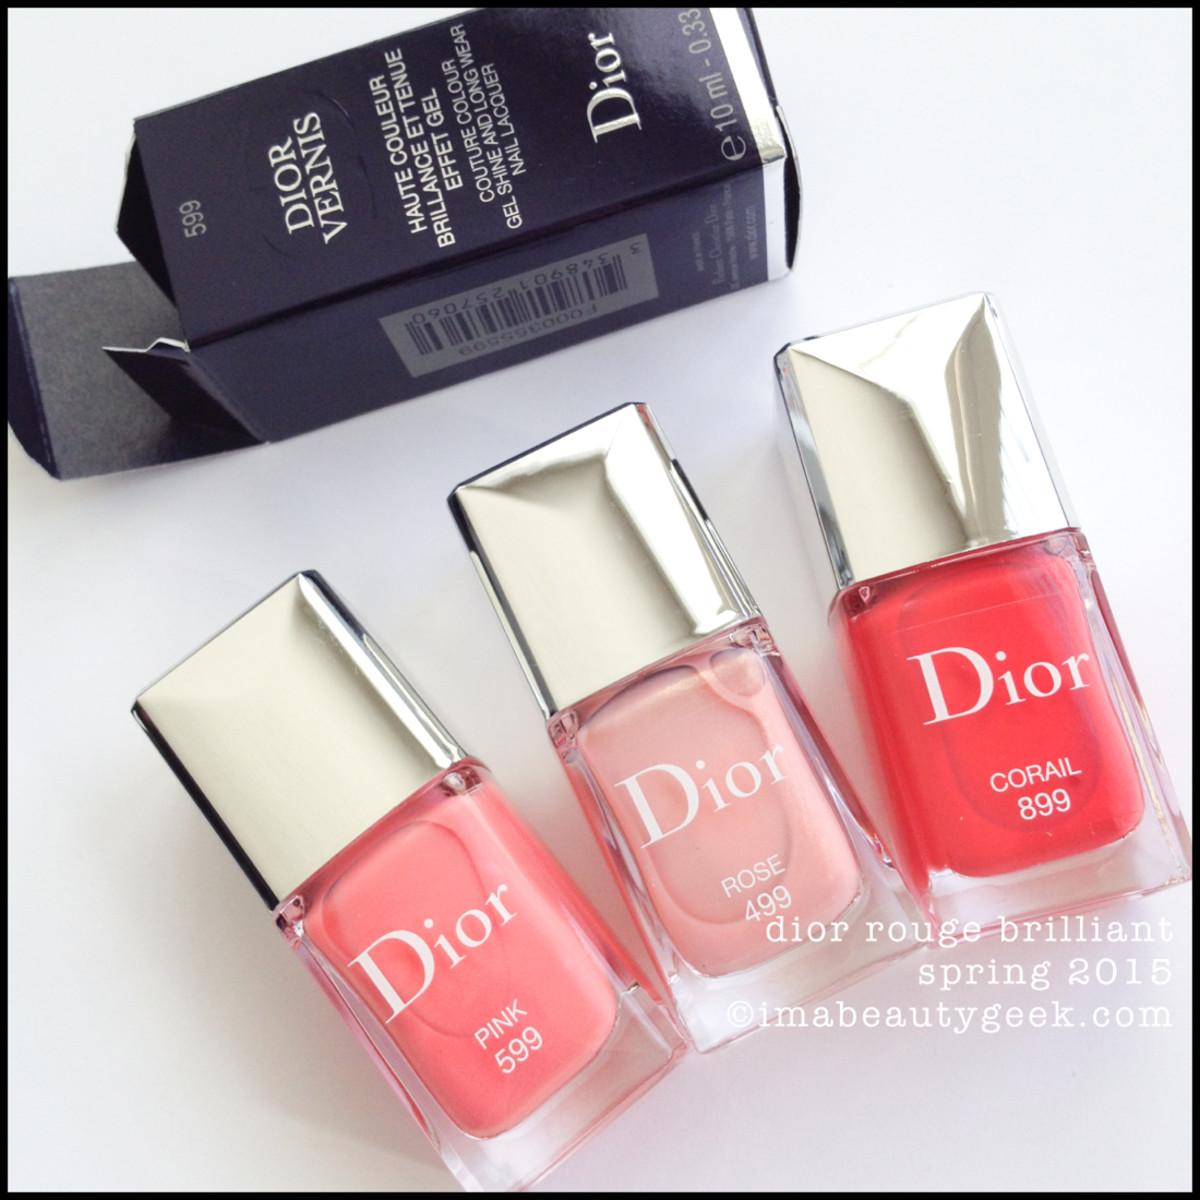 Dior Rouge Brilliant Vernis Spring 2015 Pink 599 Rose 499 Corail 899